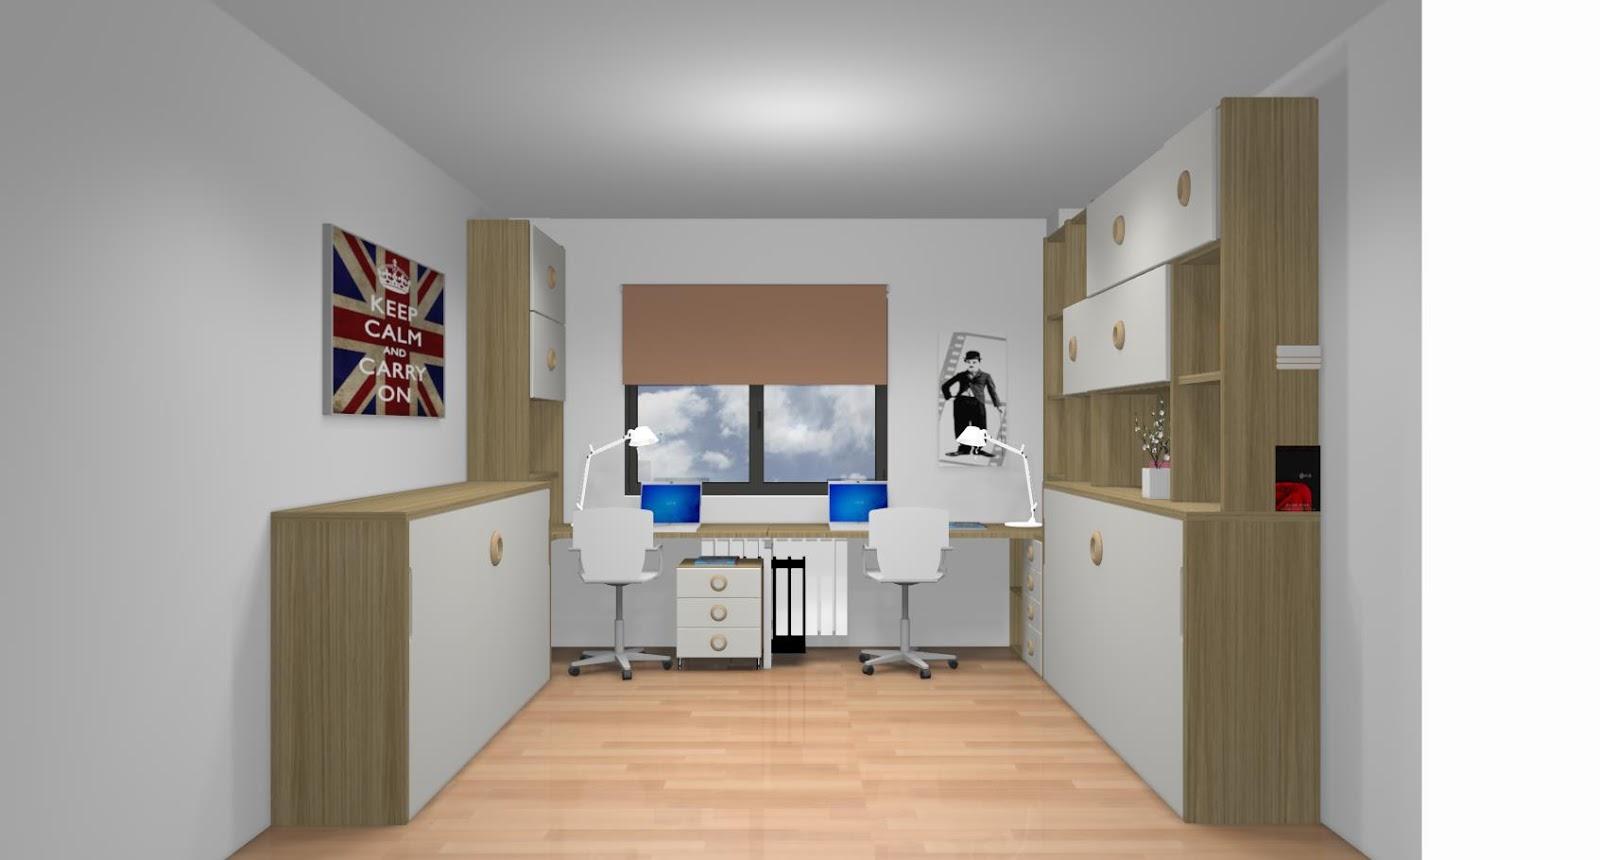 Dormitorios juveniles a medida con cama compacto